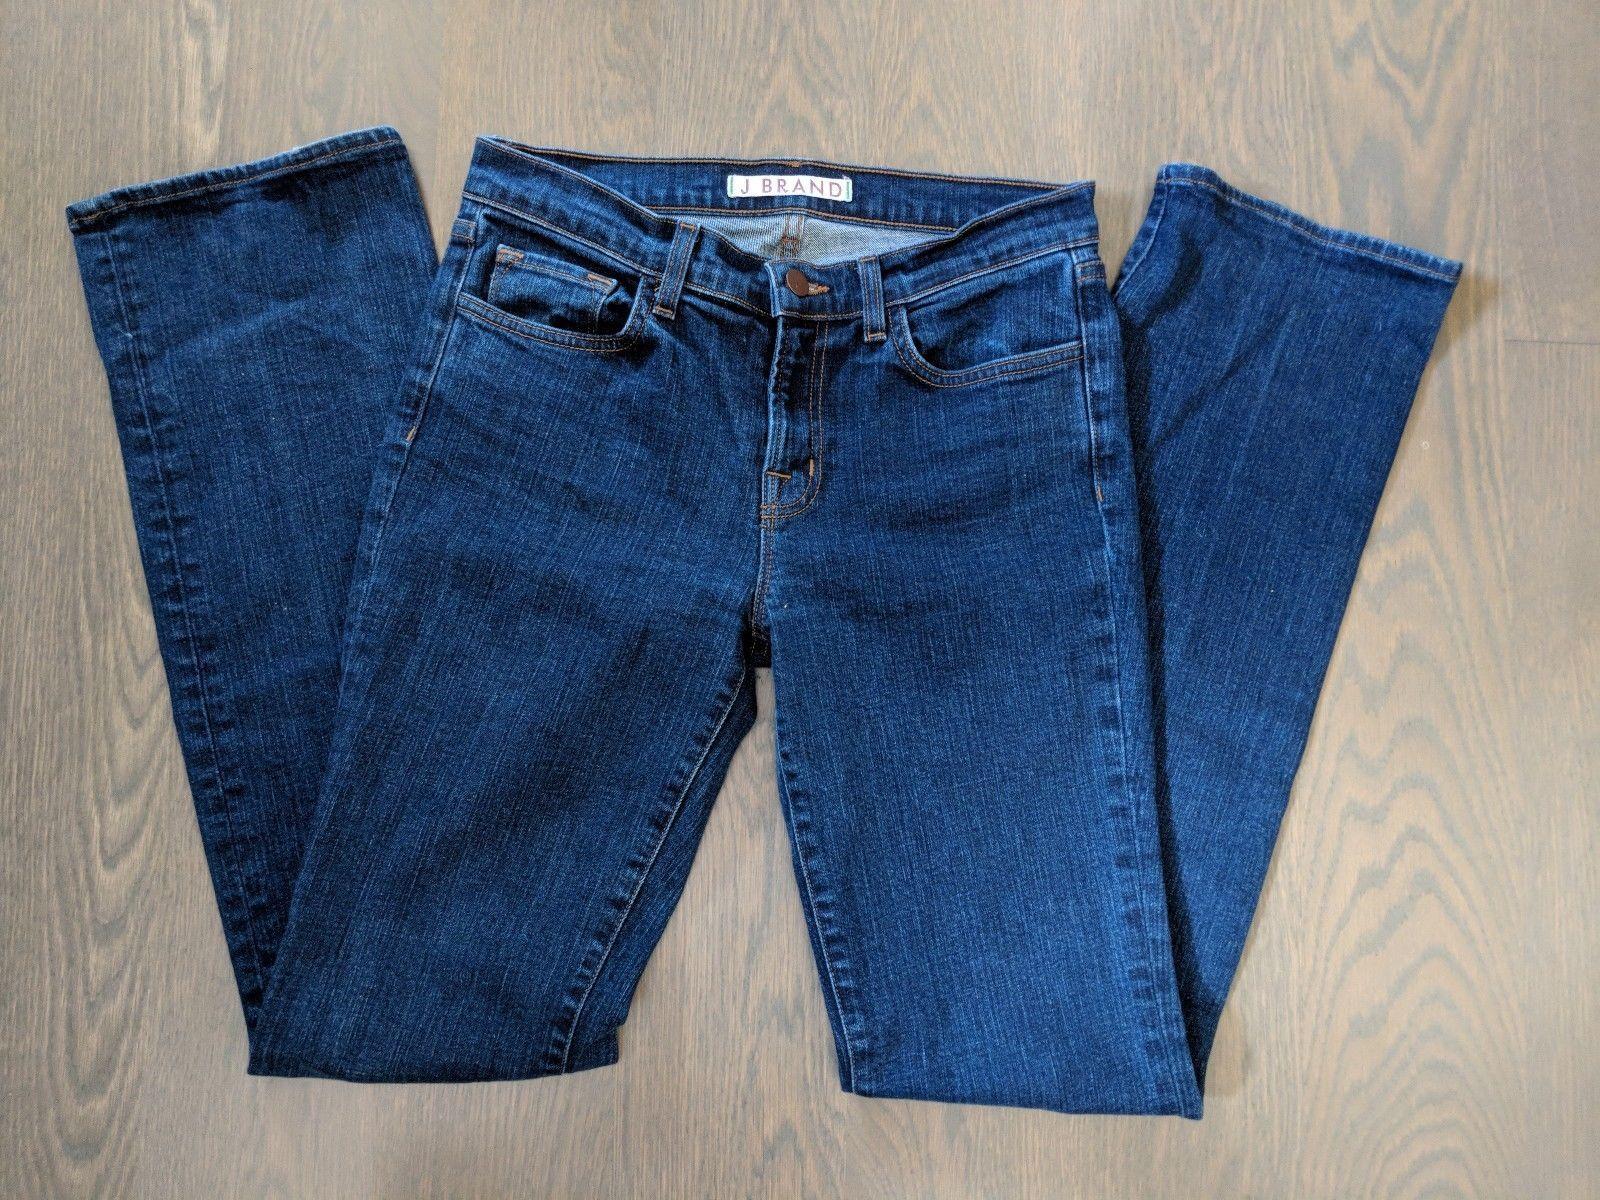 J Brand 28 Aruba Denim Skinny Slim Stretch Medium Wash Jeans Womens Pants